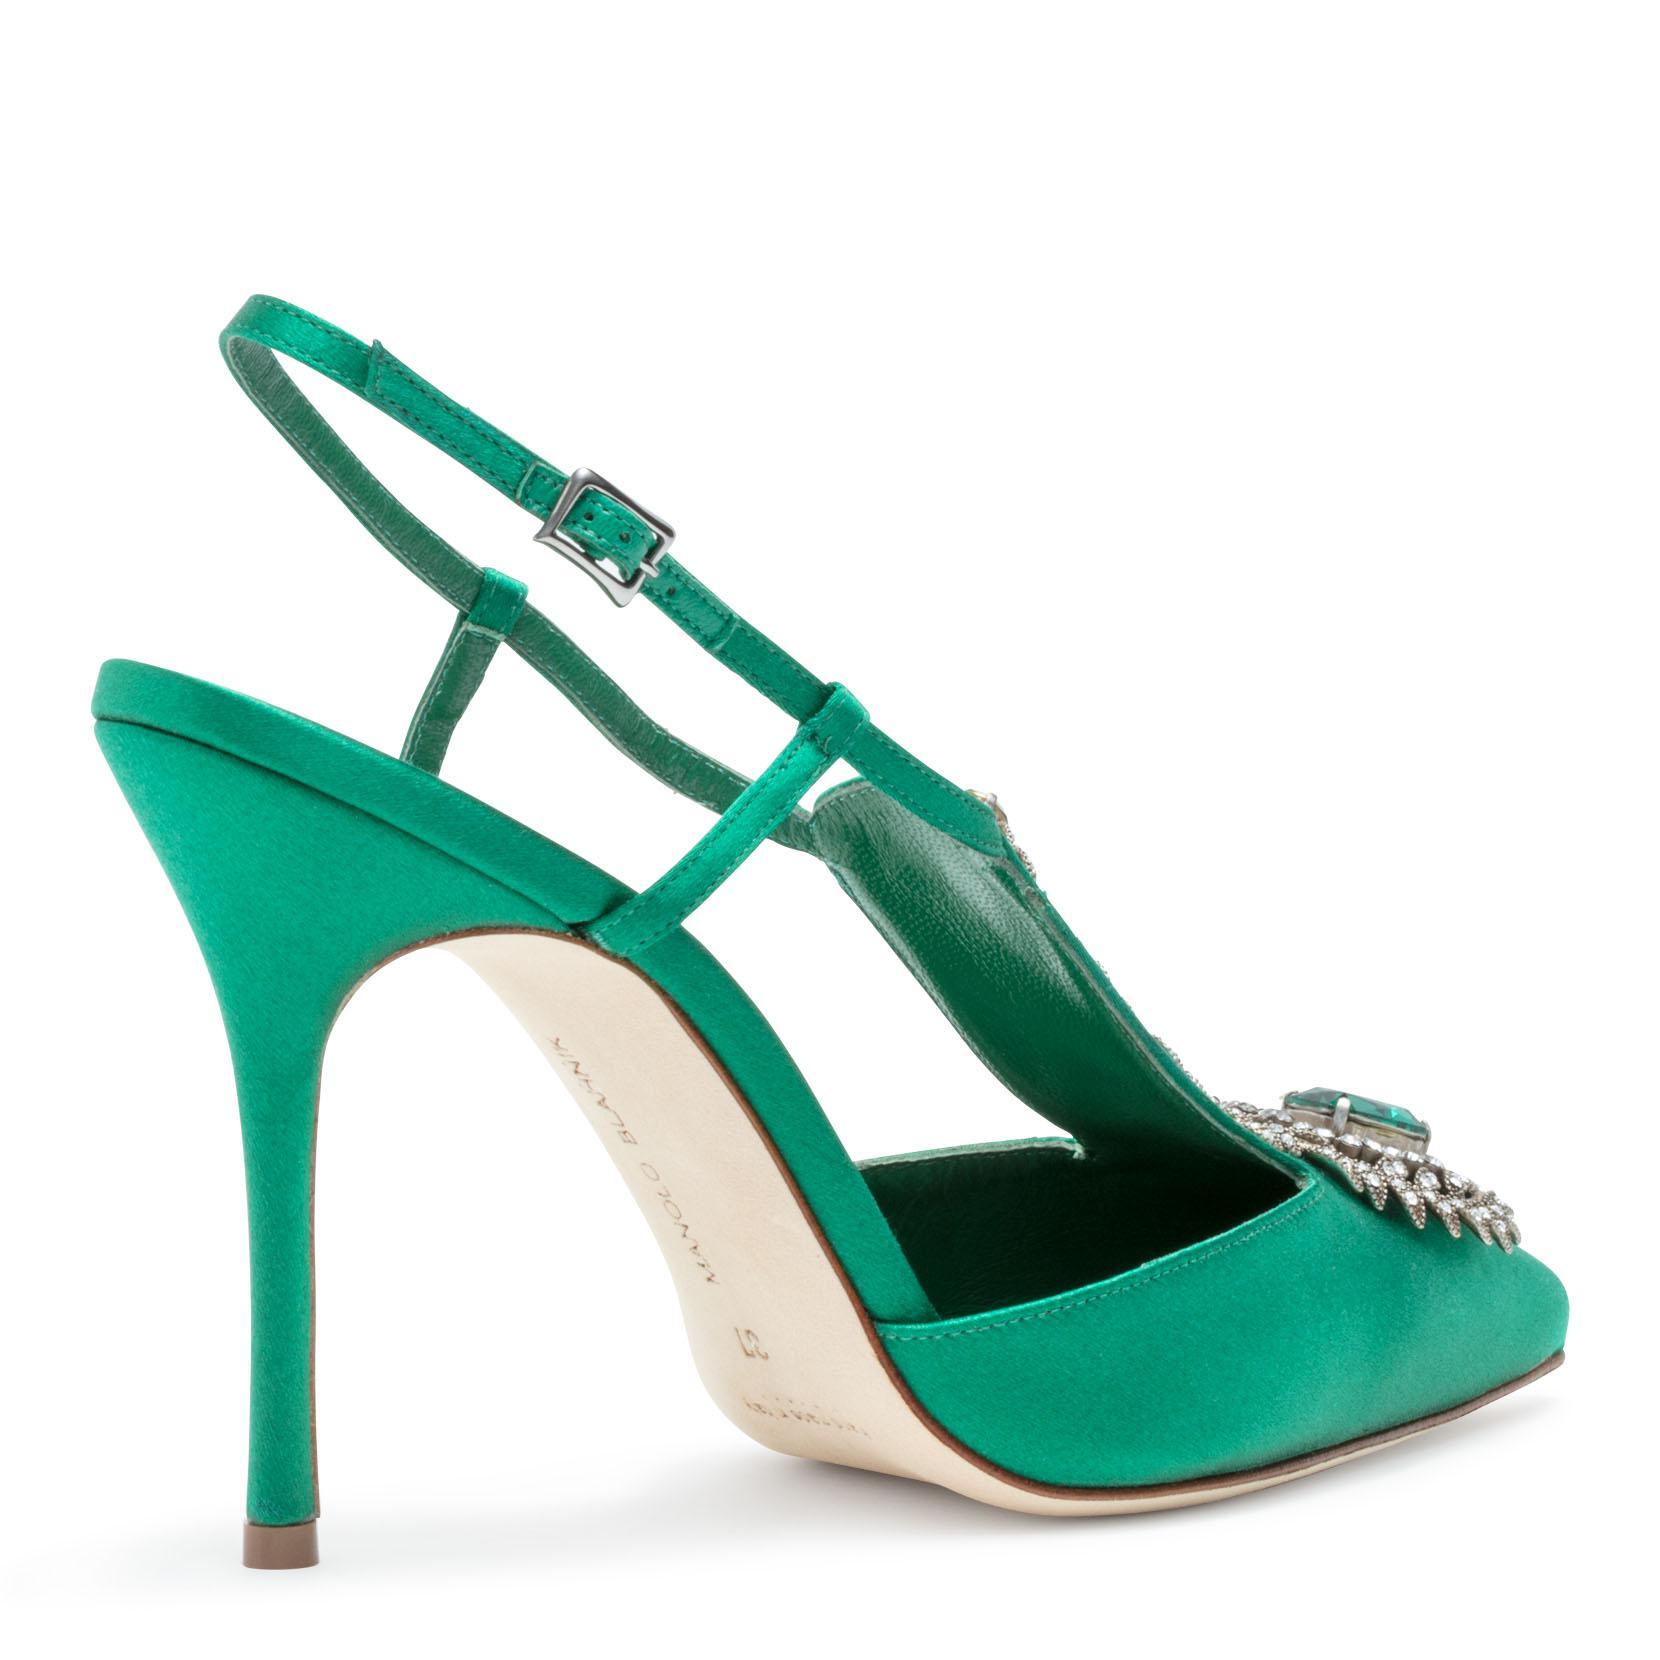 Jamala 105 Emerald Satin Pumps Manolo Blahnik CefQVp